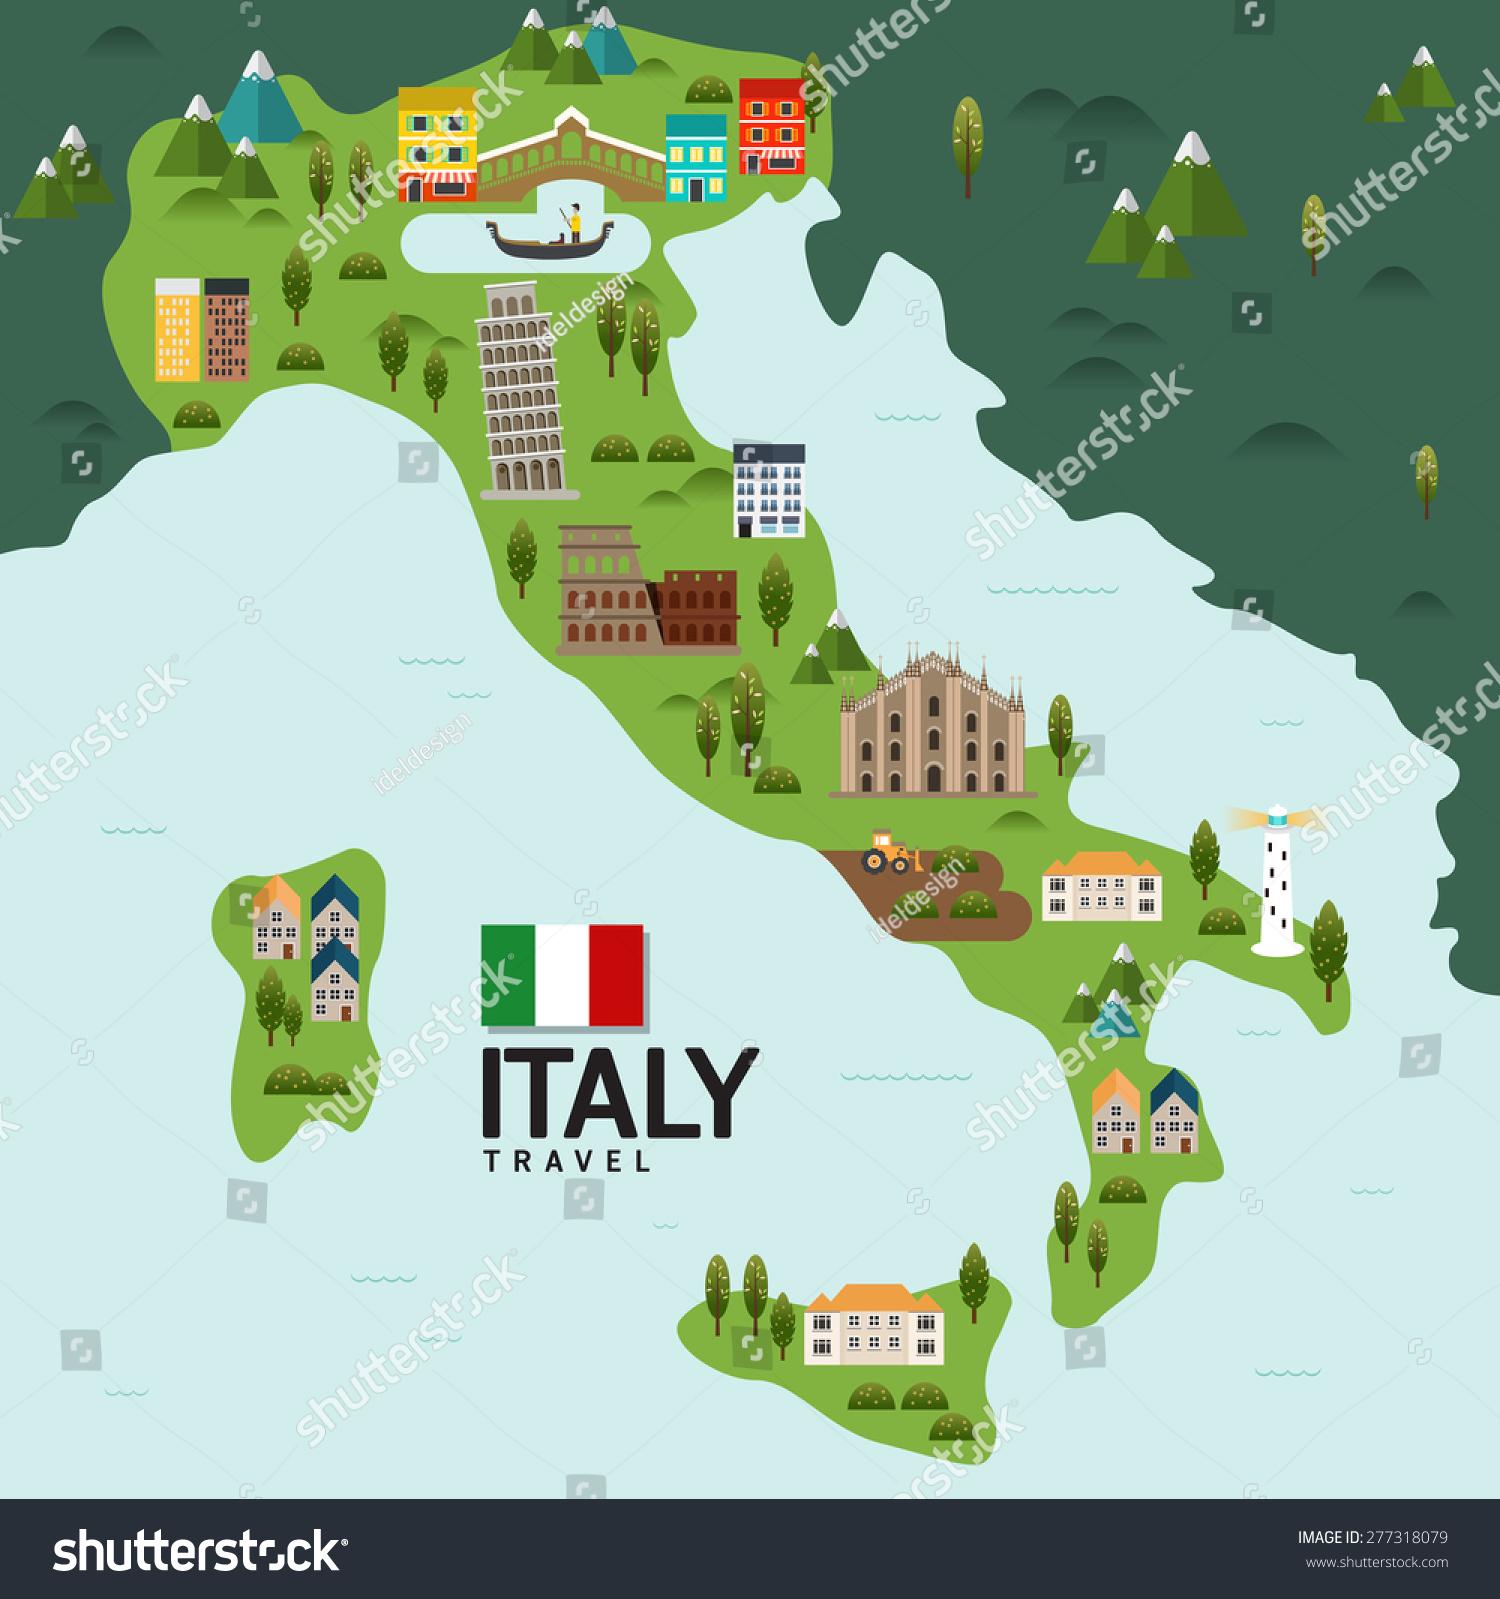 Design Italy Milan Rome Travel Landmark Stock Vector